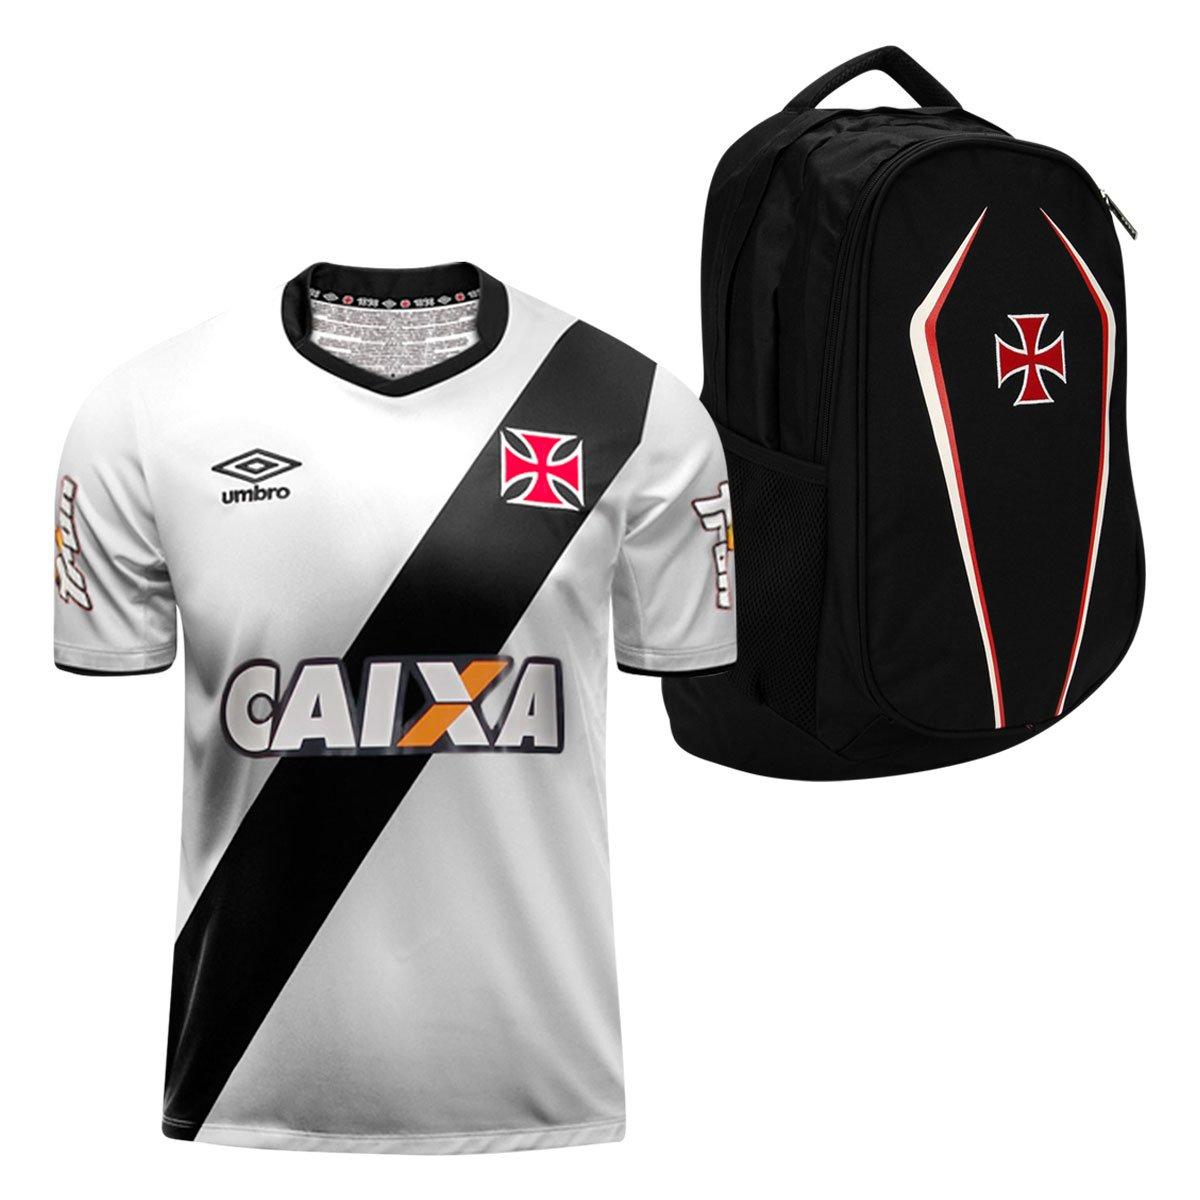 Kit Vasco da Gama - Camisa Umbro II 14 15 + Mochila - Compre Agora ... 9d0db7d3a273b